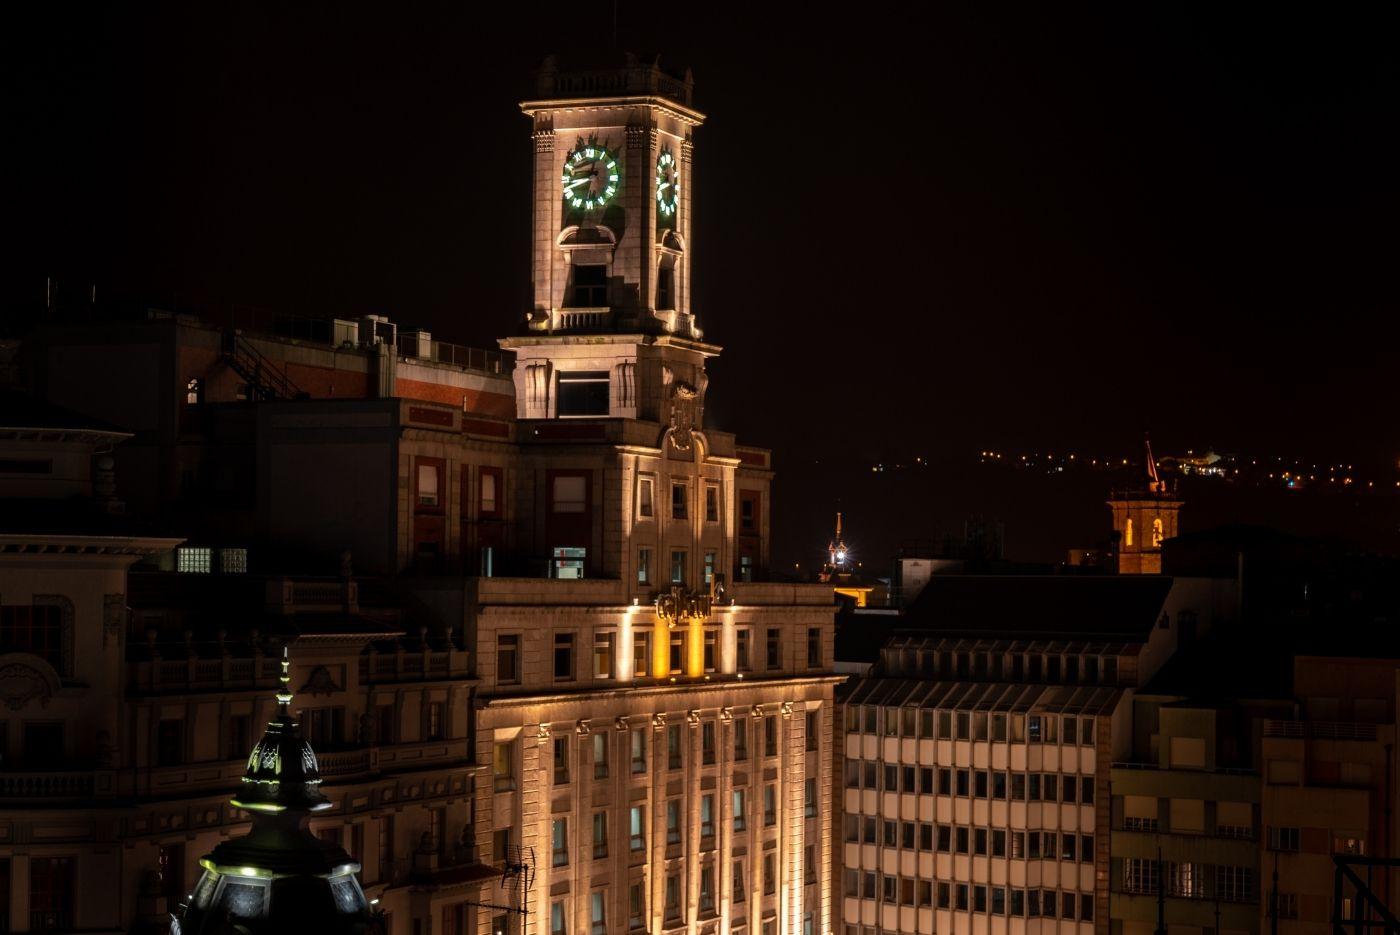 Apartamento-Suite-Deluxe-63-Oviedo-1907-03